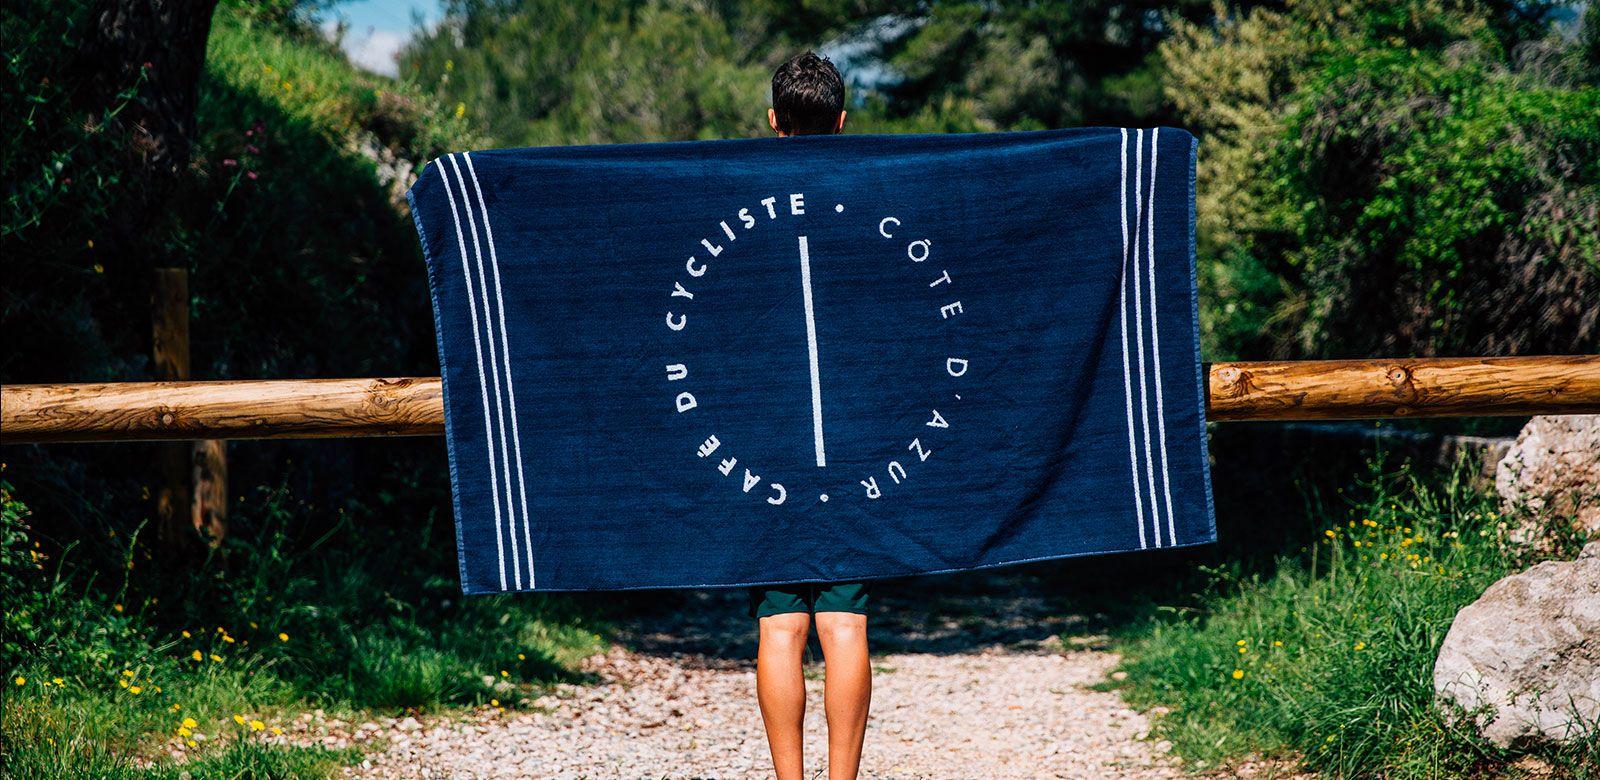 cafedu/cmsbuilder/men-cycling-clothing-block6-130720_4.jpg